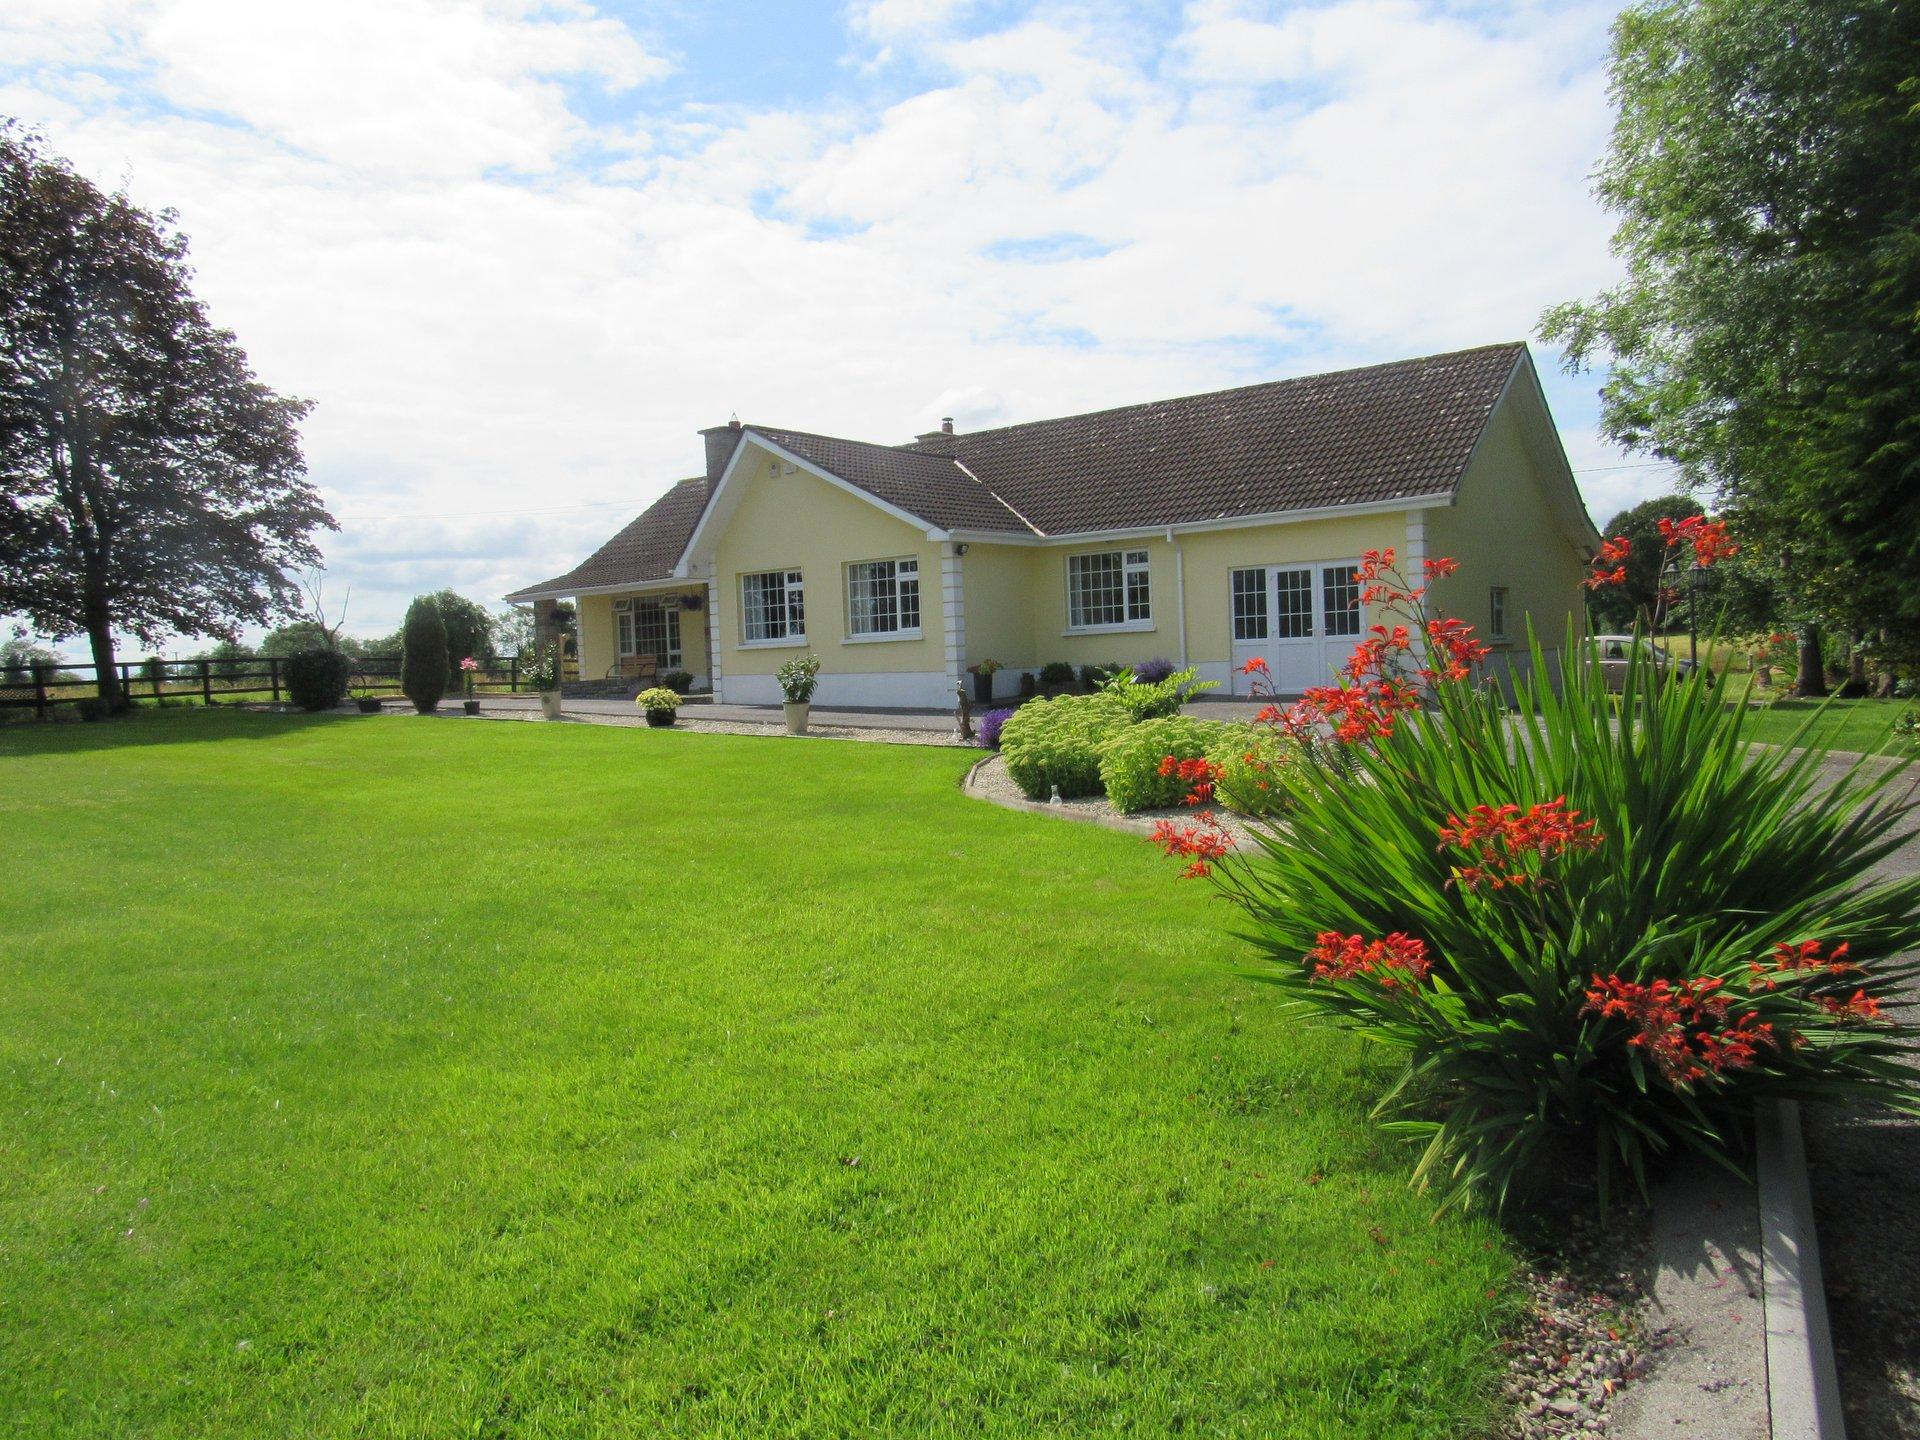 The Oaks, Knockloughlin, Ballinalee Road, Longford, Co. Longford N39 R5D4